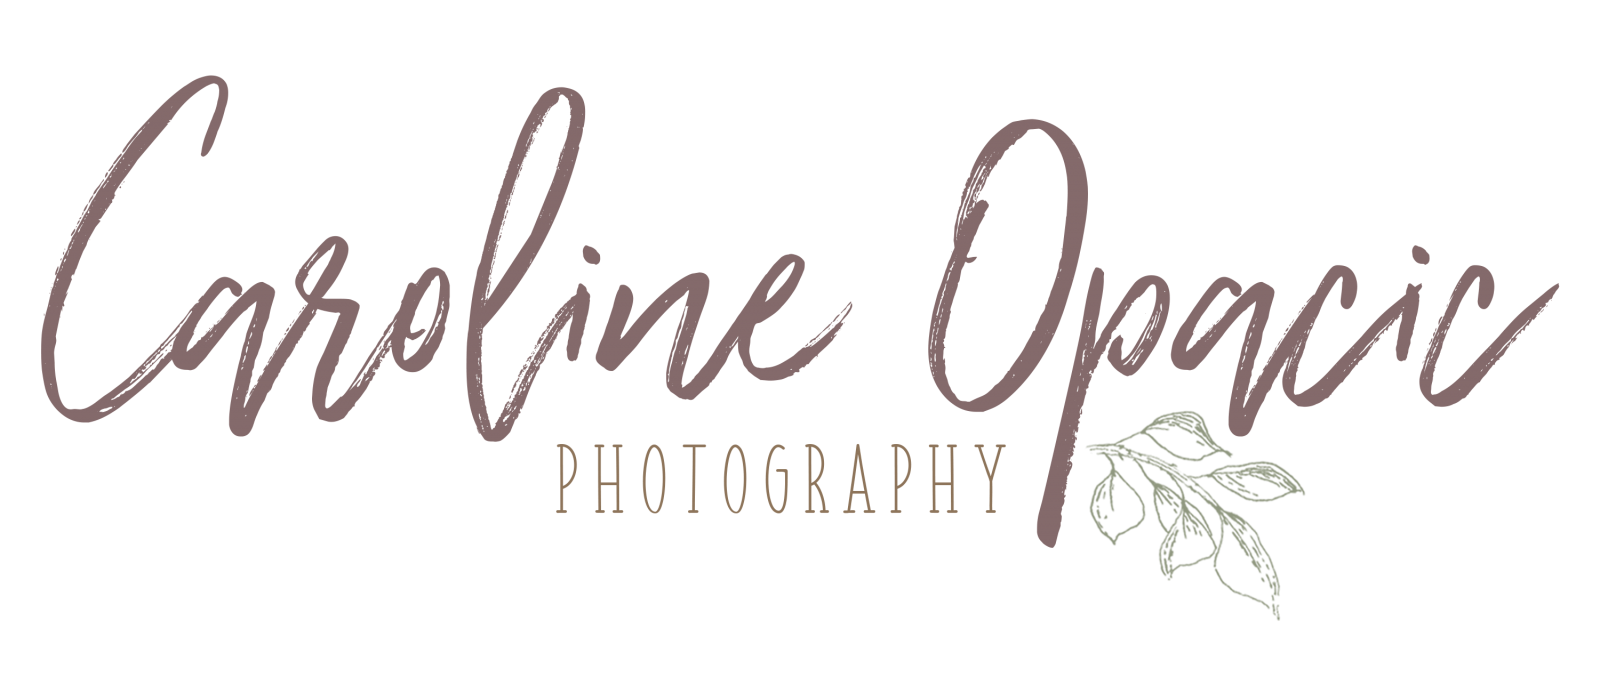 Caroline Opacic Photography